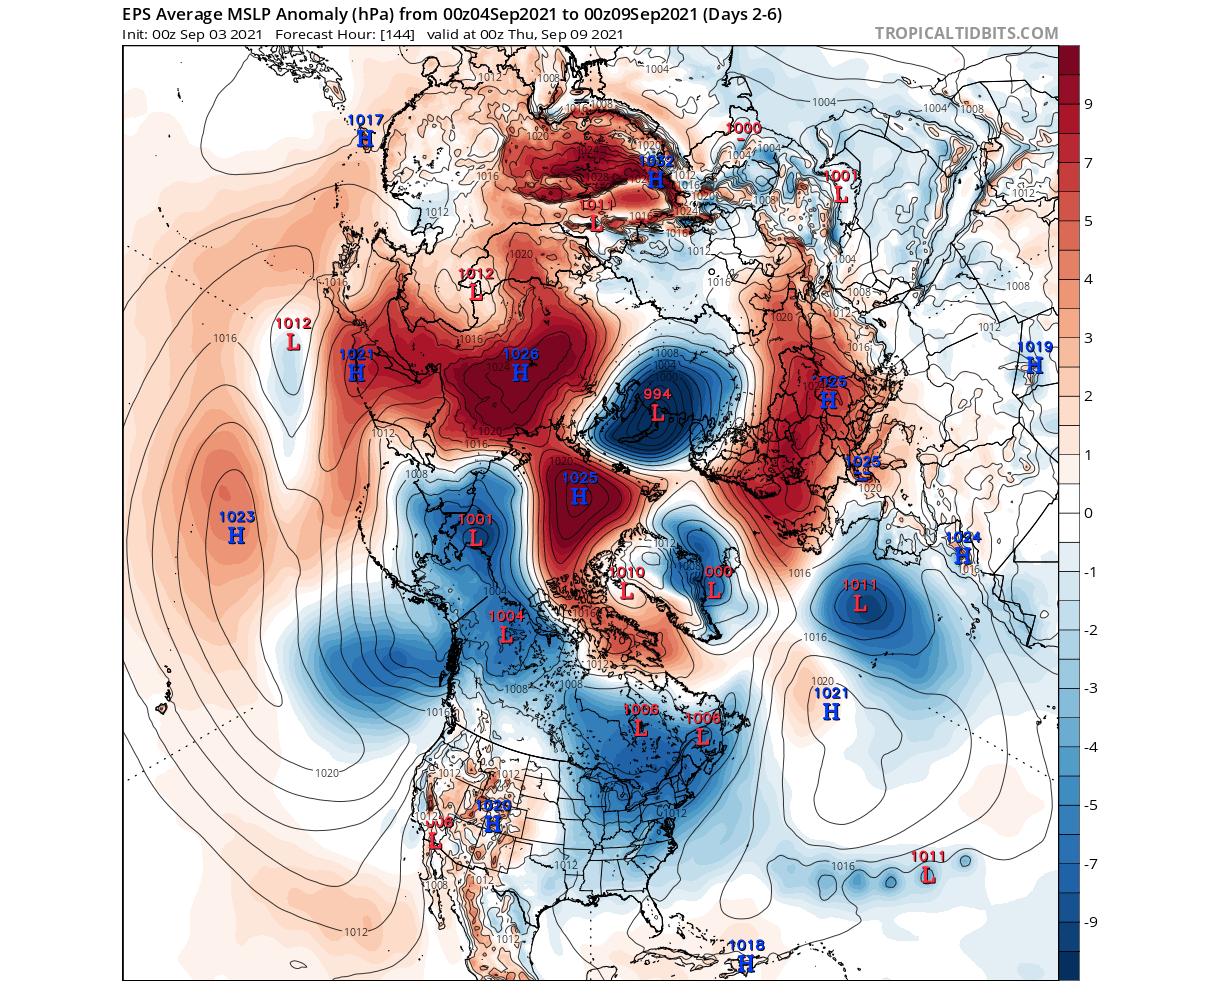 north-hemisphere-ecmwf-pressure-anomaly-forecast-september-week-1